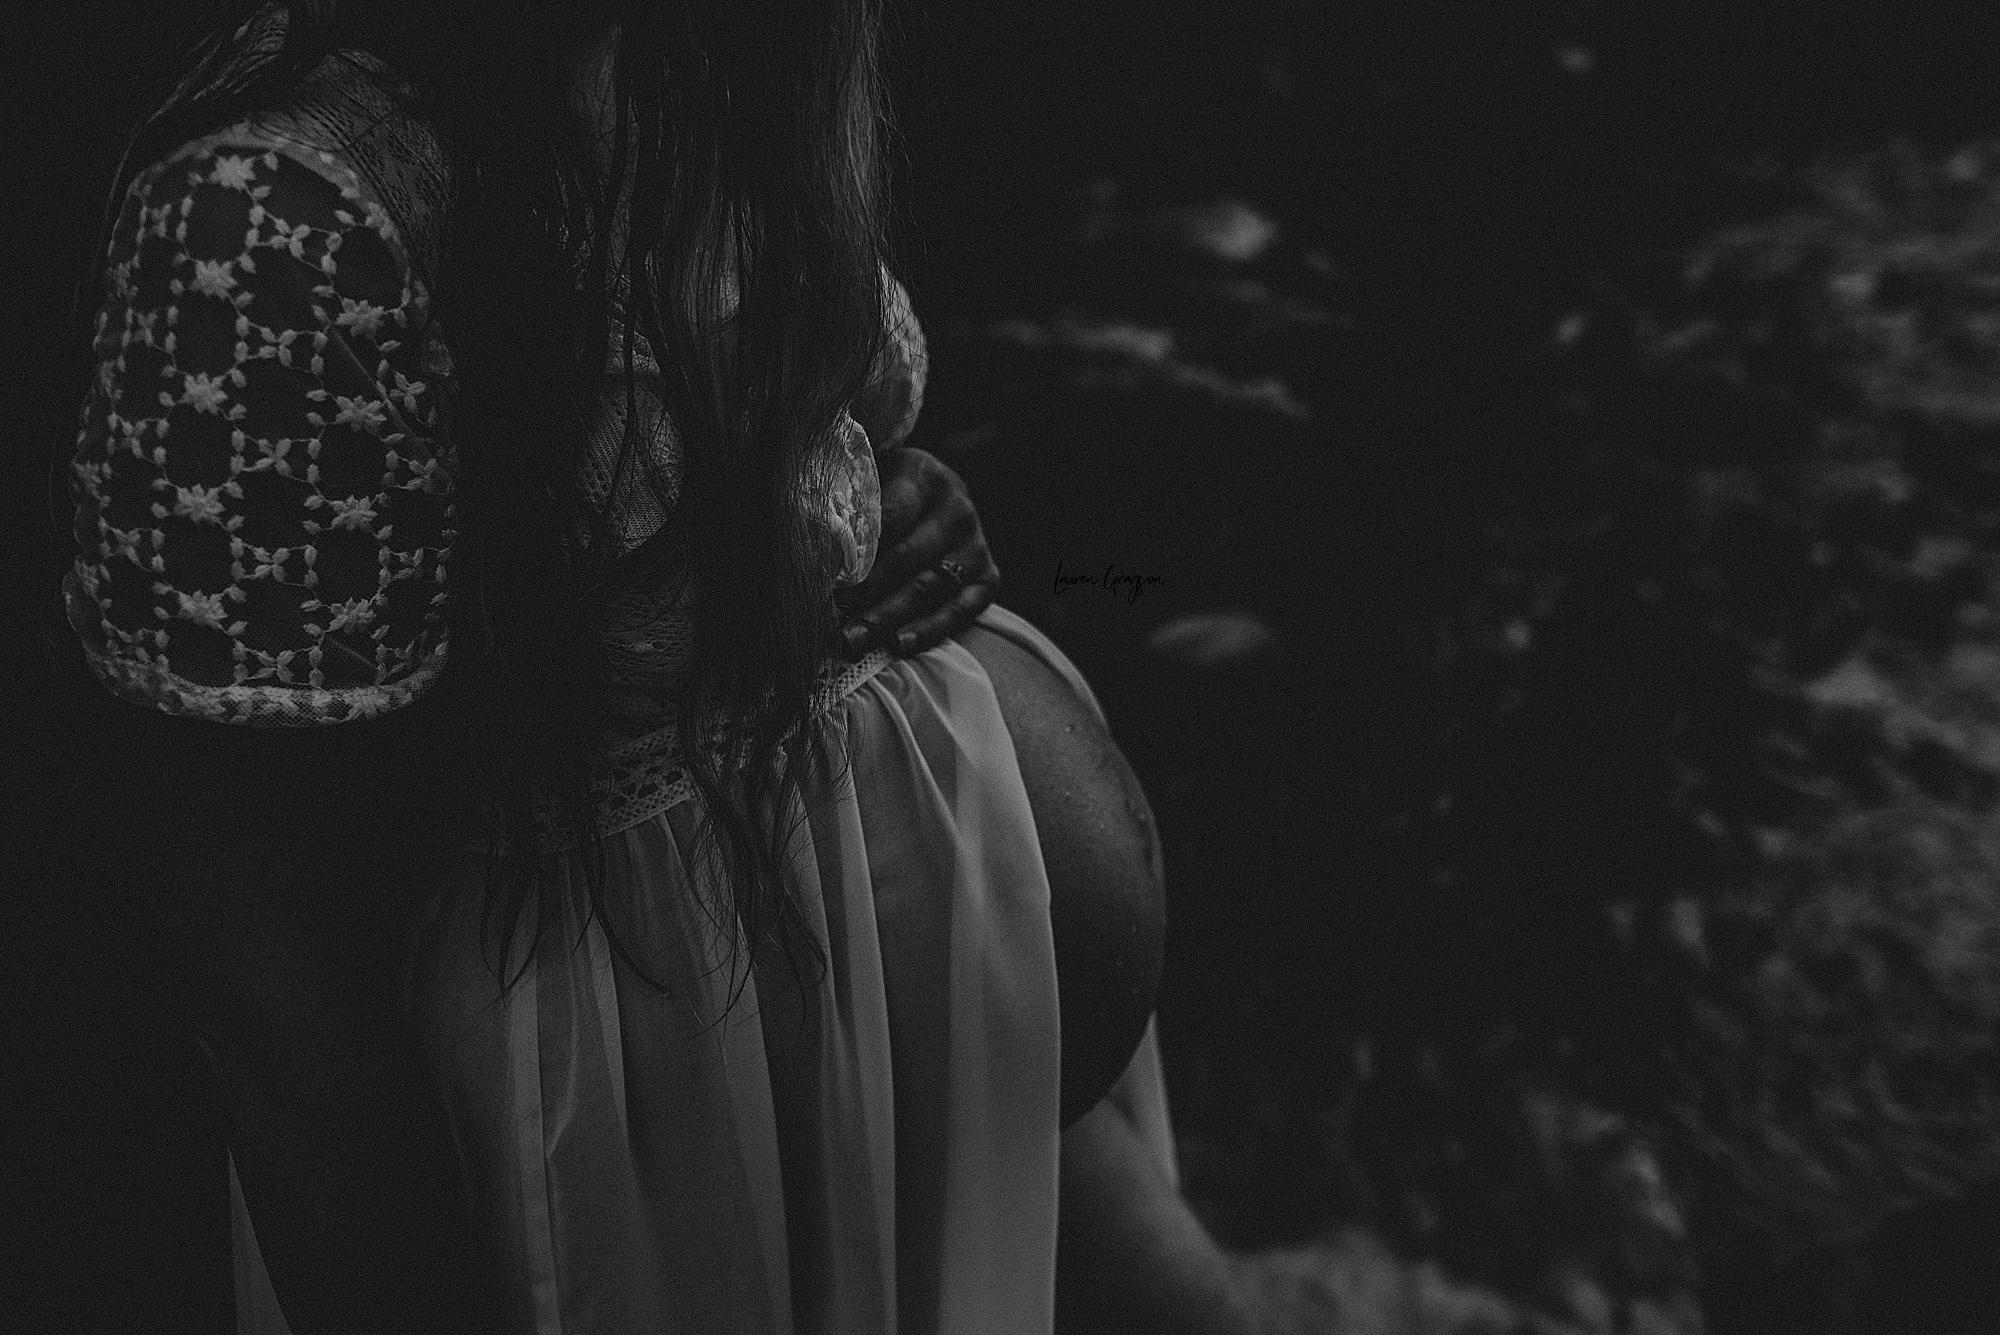 lauren-grayson-photography-akron-ohio-maternity-photographer-waterfall-sarah-f_0030.jpg